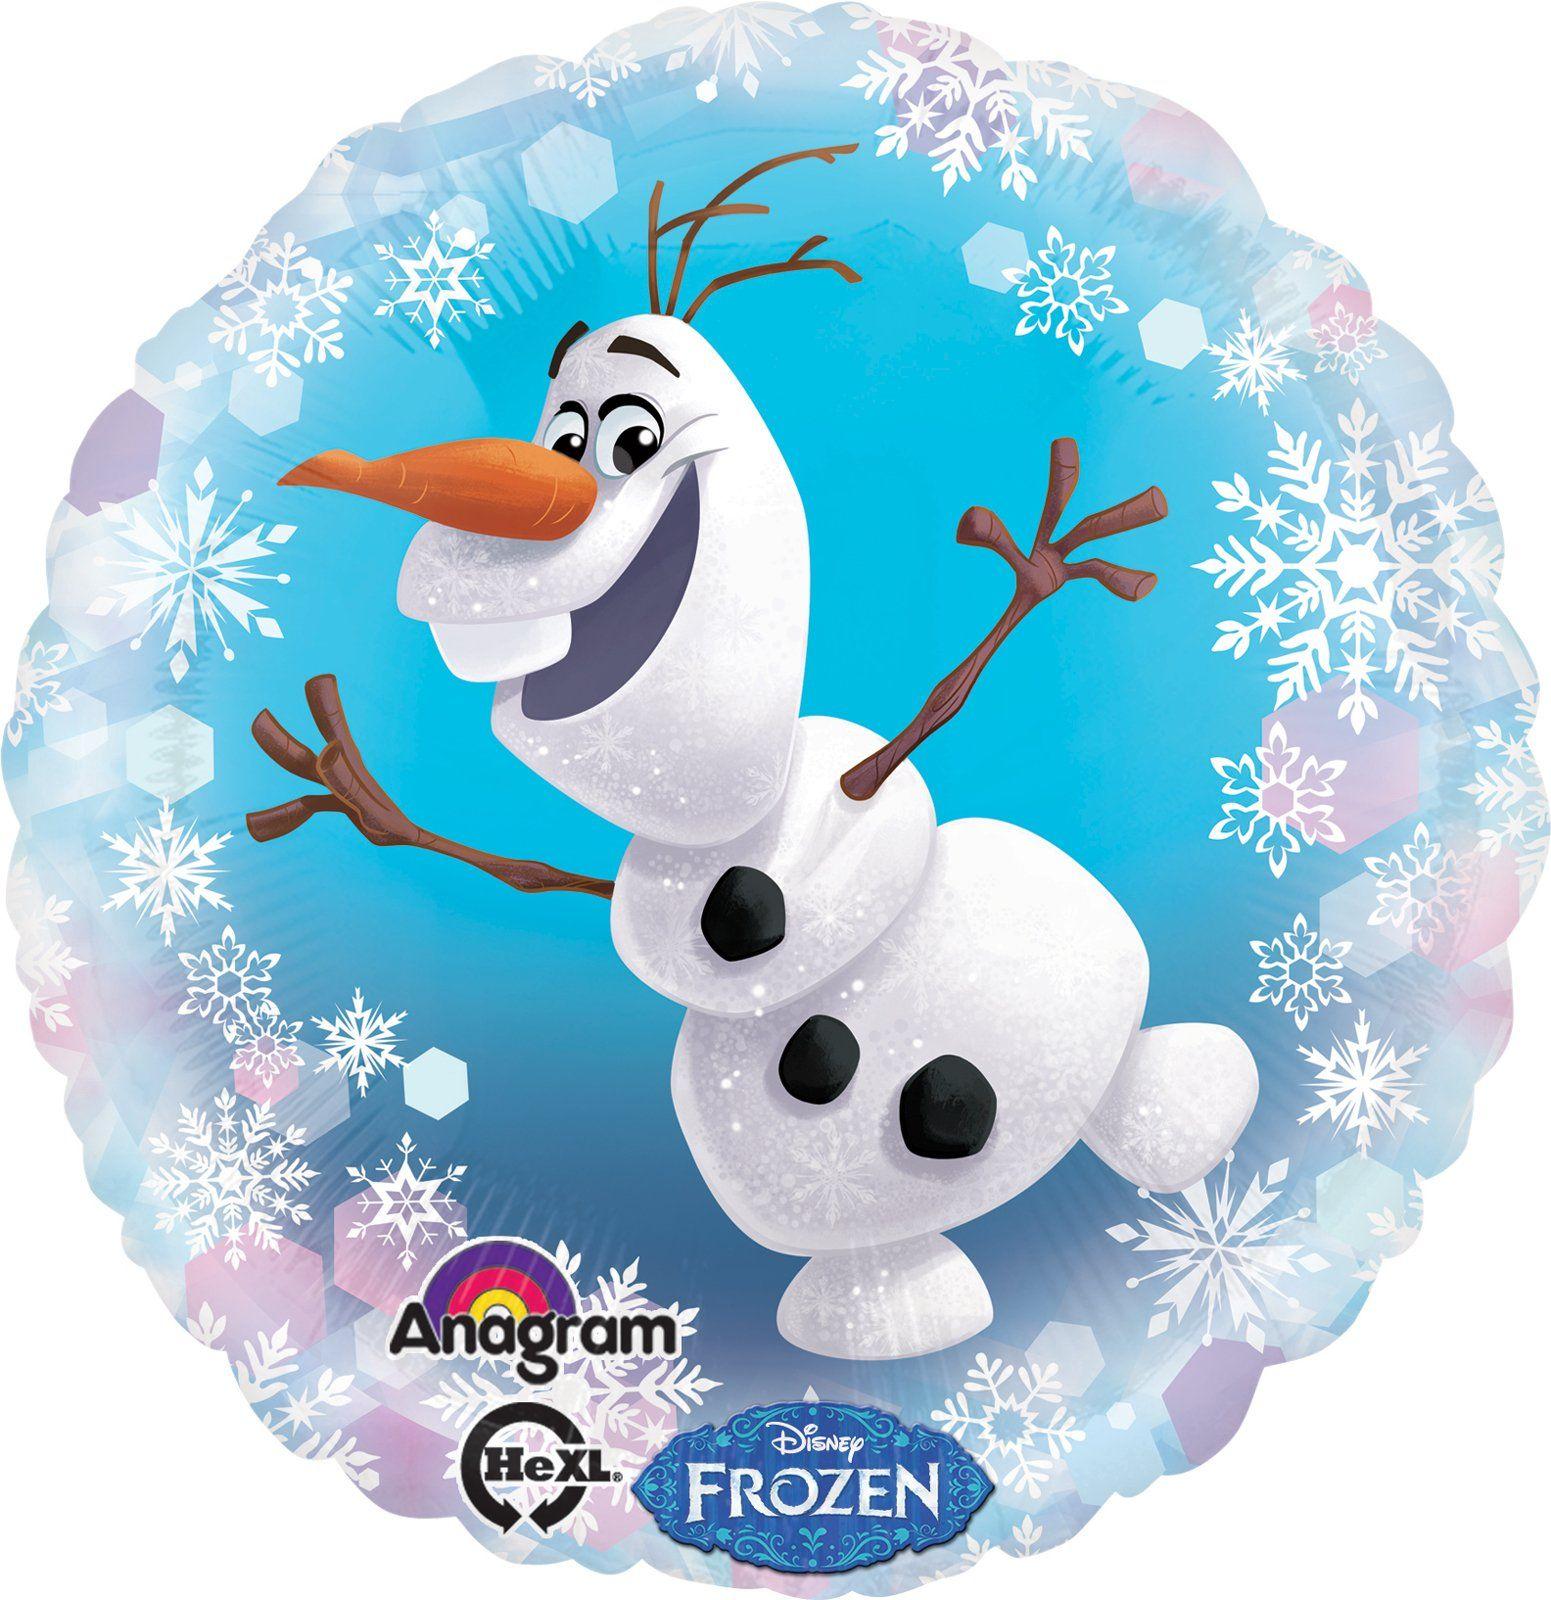 Disney Frozen Olaf Foil Balloon from BirthdayExpress.com